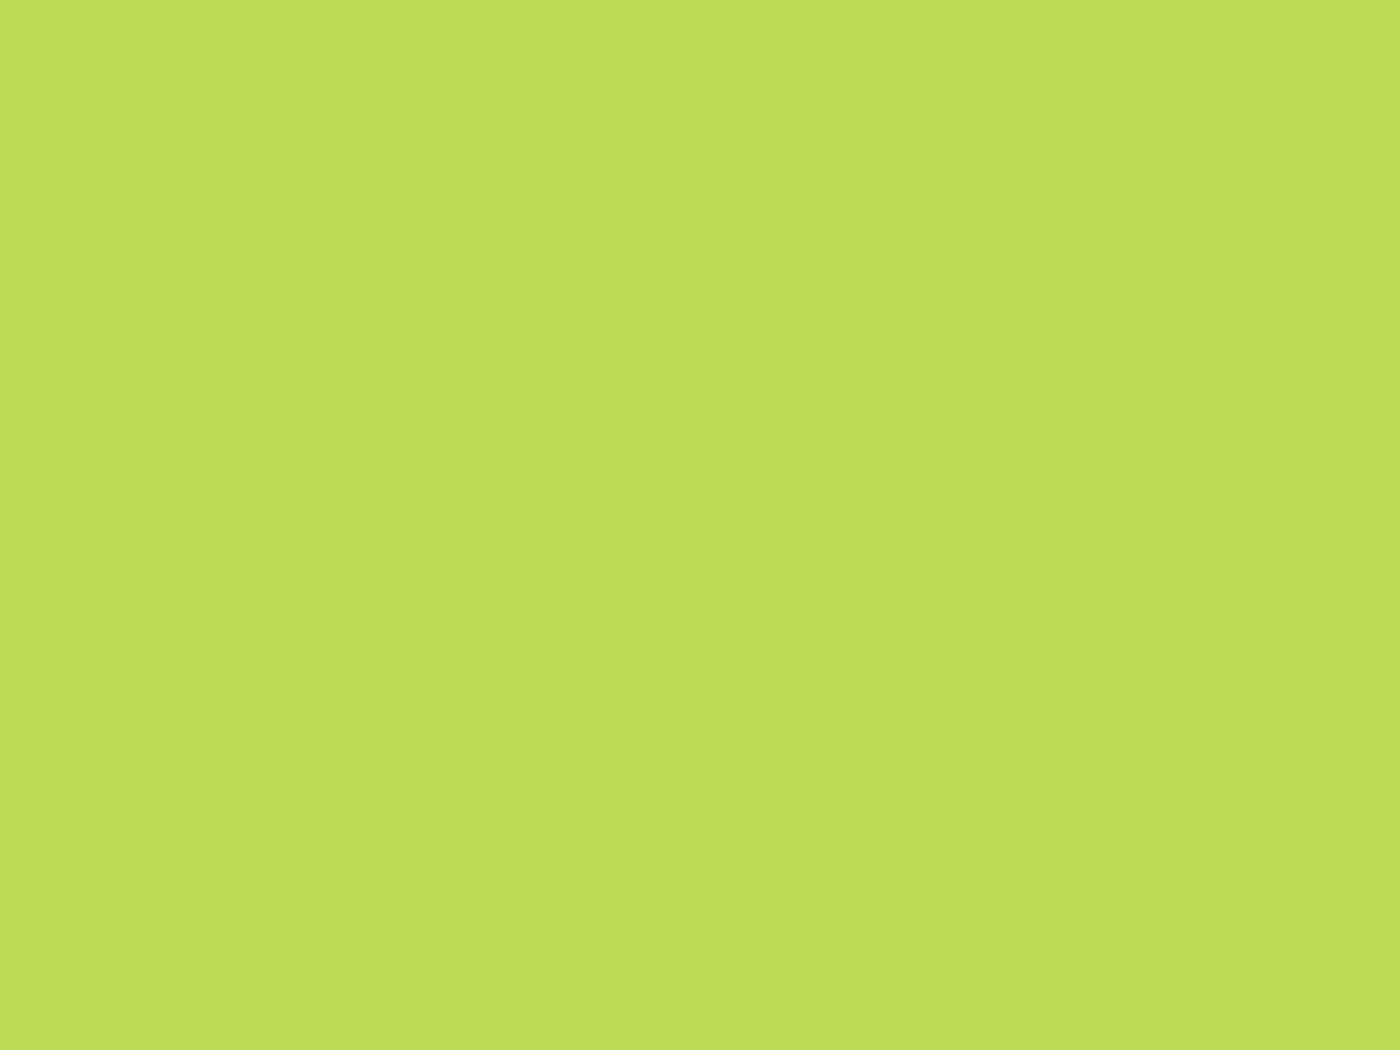 1400x1050 June Bud Solid Color Background